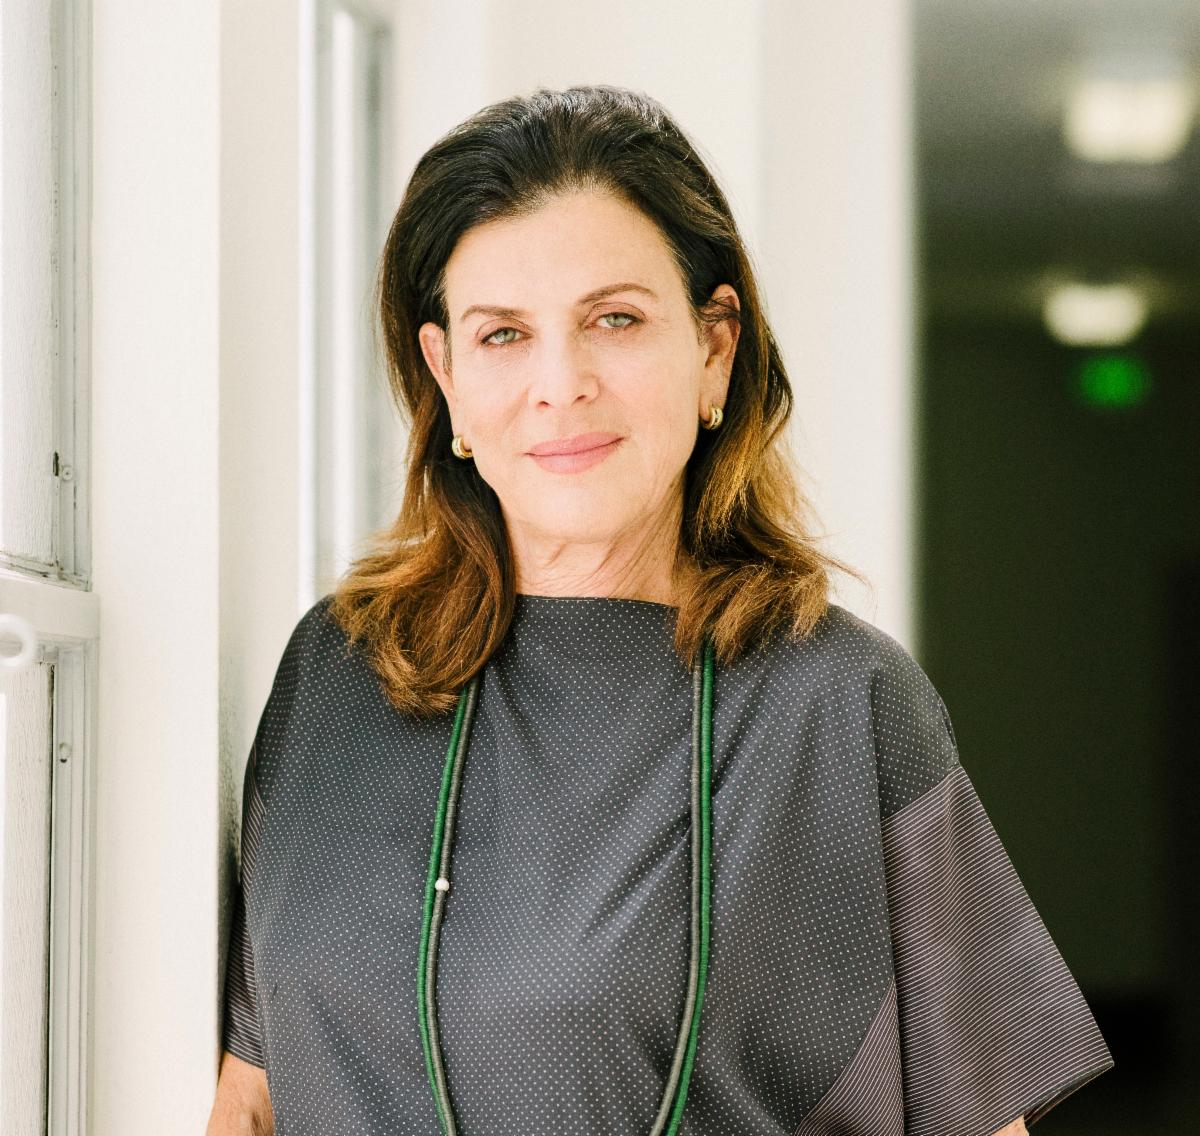 Commissioner Mia Lehrer